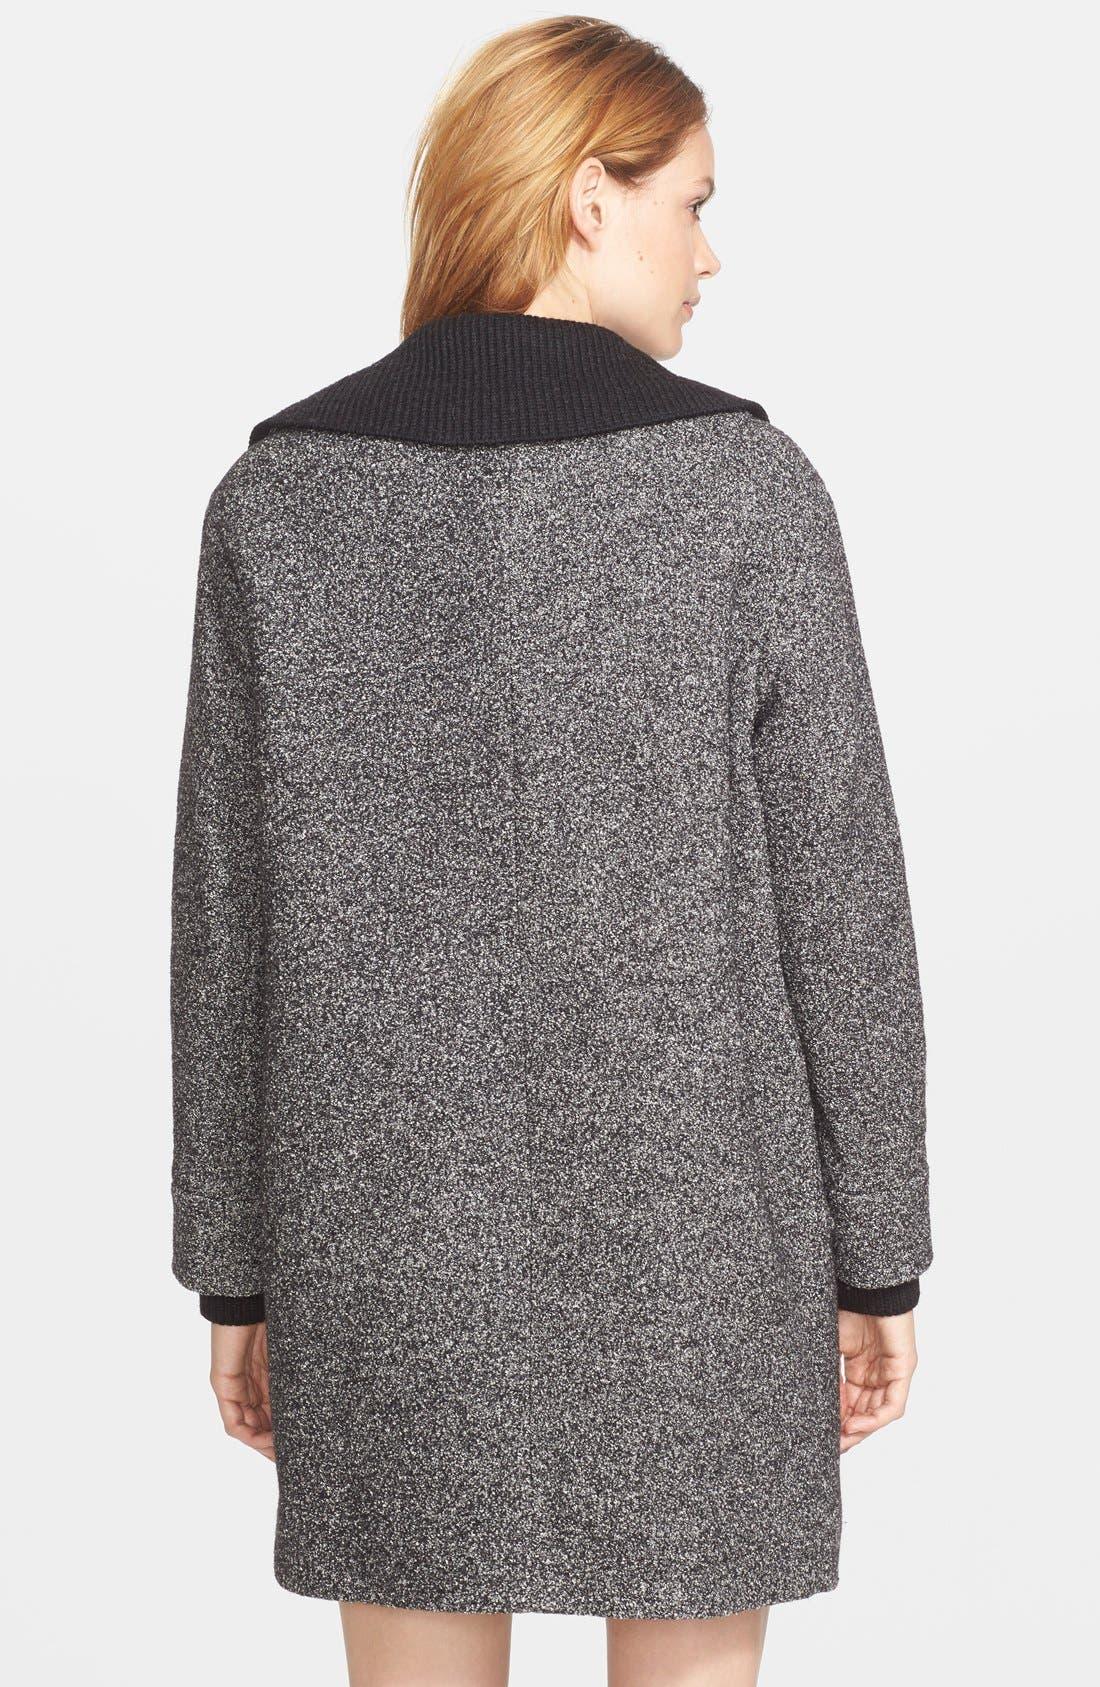 Rib Knit Collar Asymmetrical Coat,                             Alternate thumbnail 2, color,                             Black/ Off White